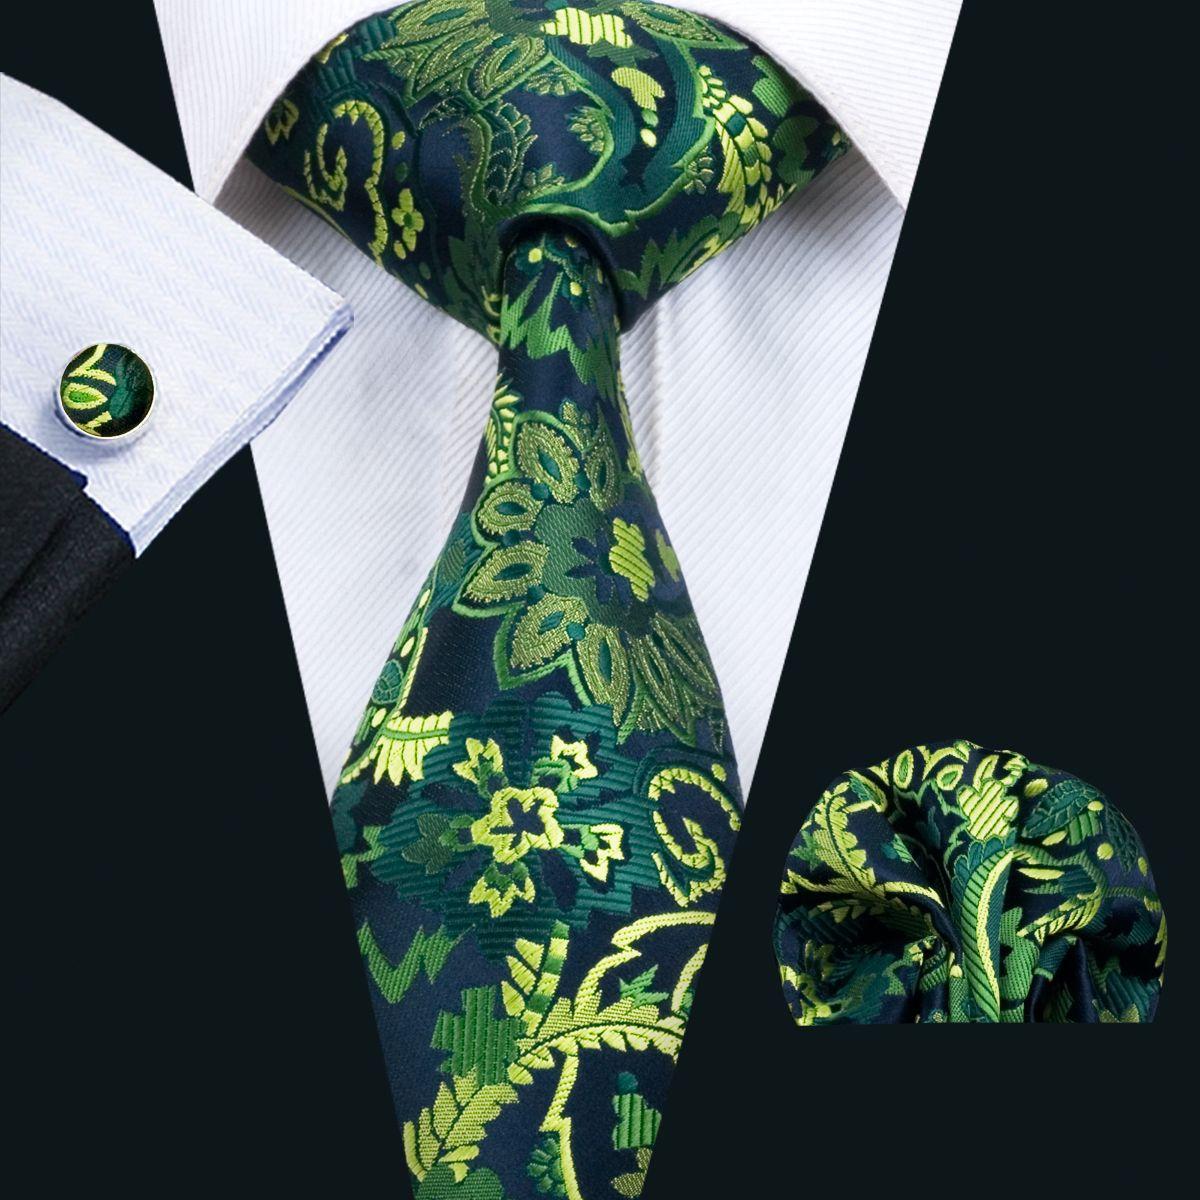 Klassische Seide Mens Ties Green Tie Sets Floral Mens Krawatte Krawatte Hanky Manschettenknöpfe Set Jacquard Woven Meeting Business Hochzeit Party Geschenk N-1444